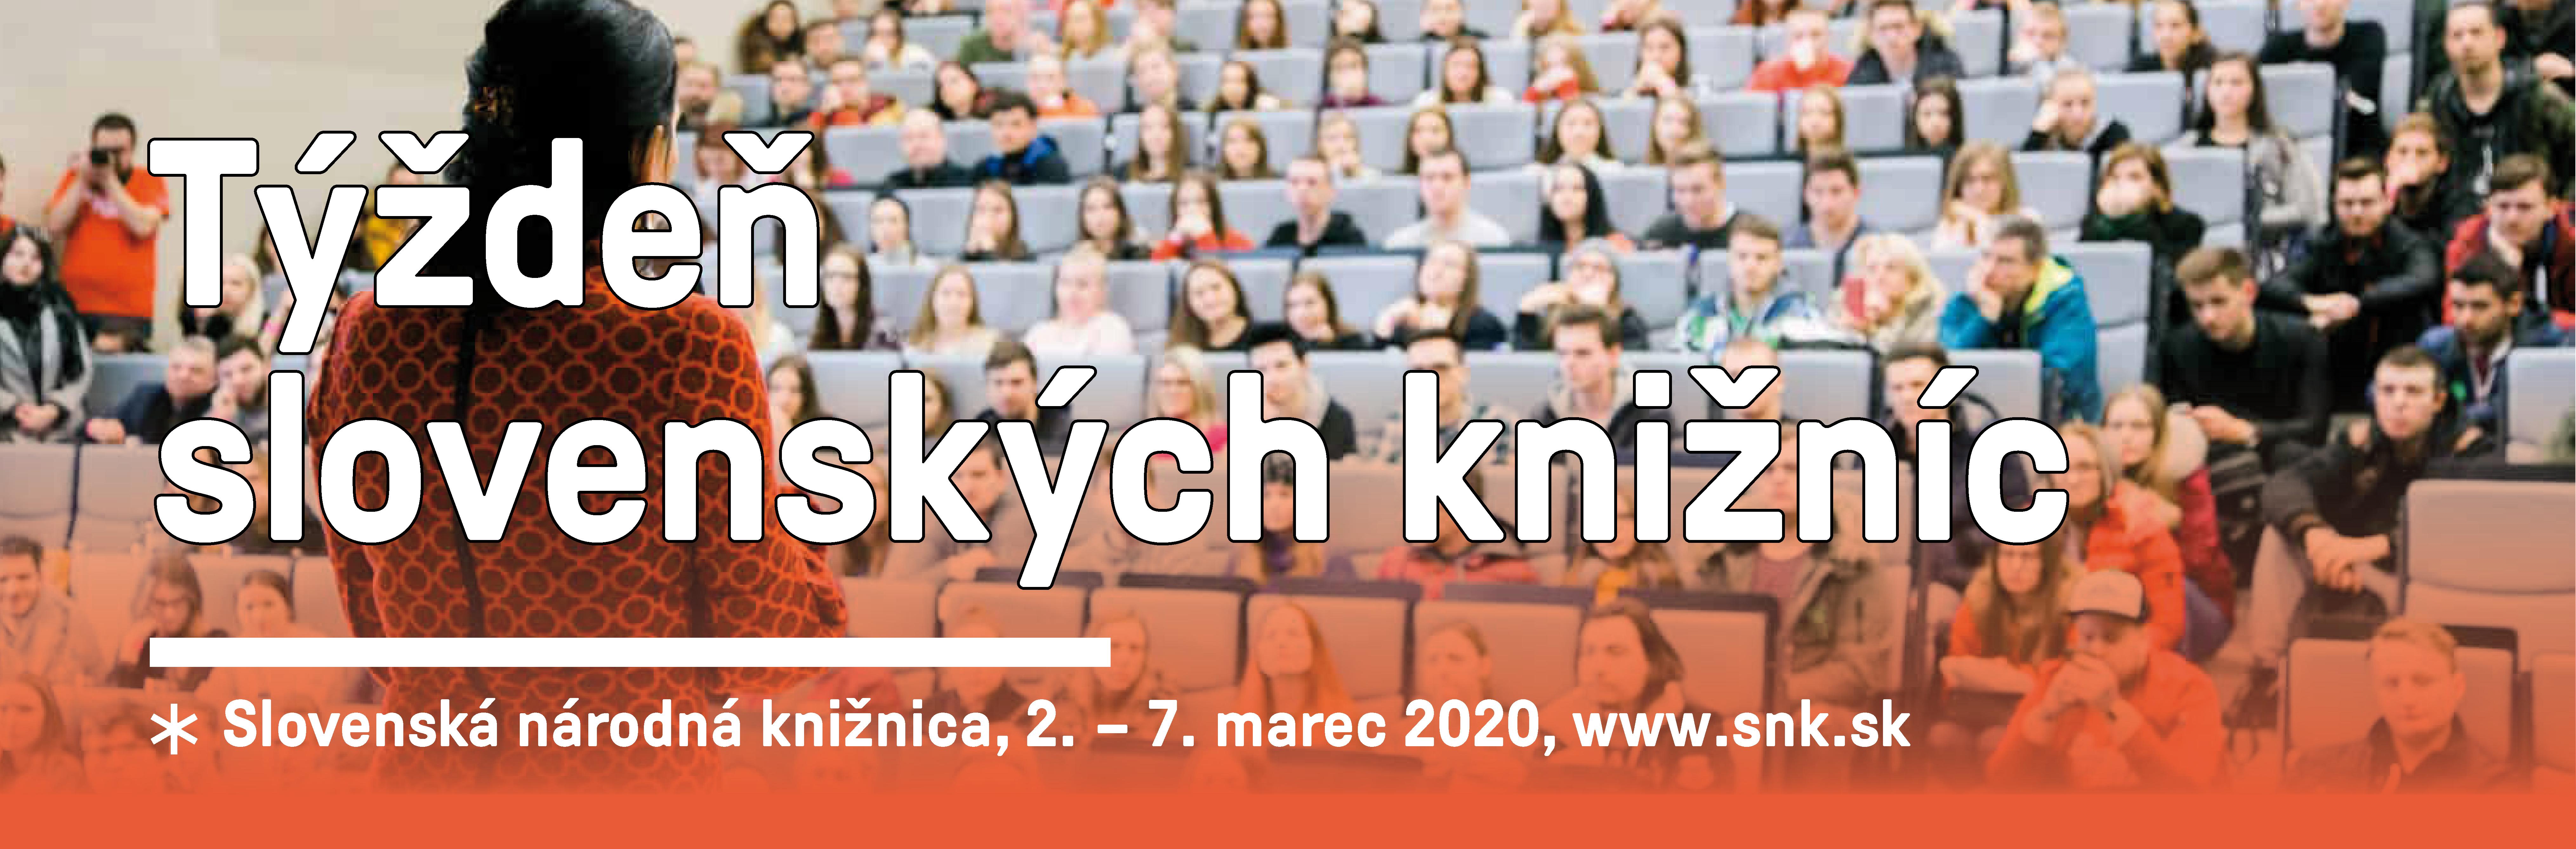 TSK 2020